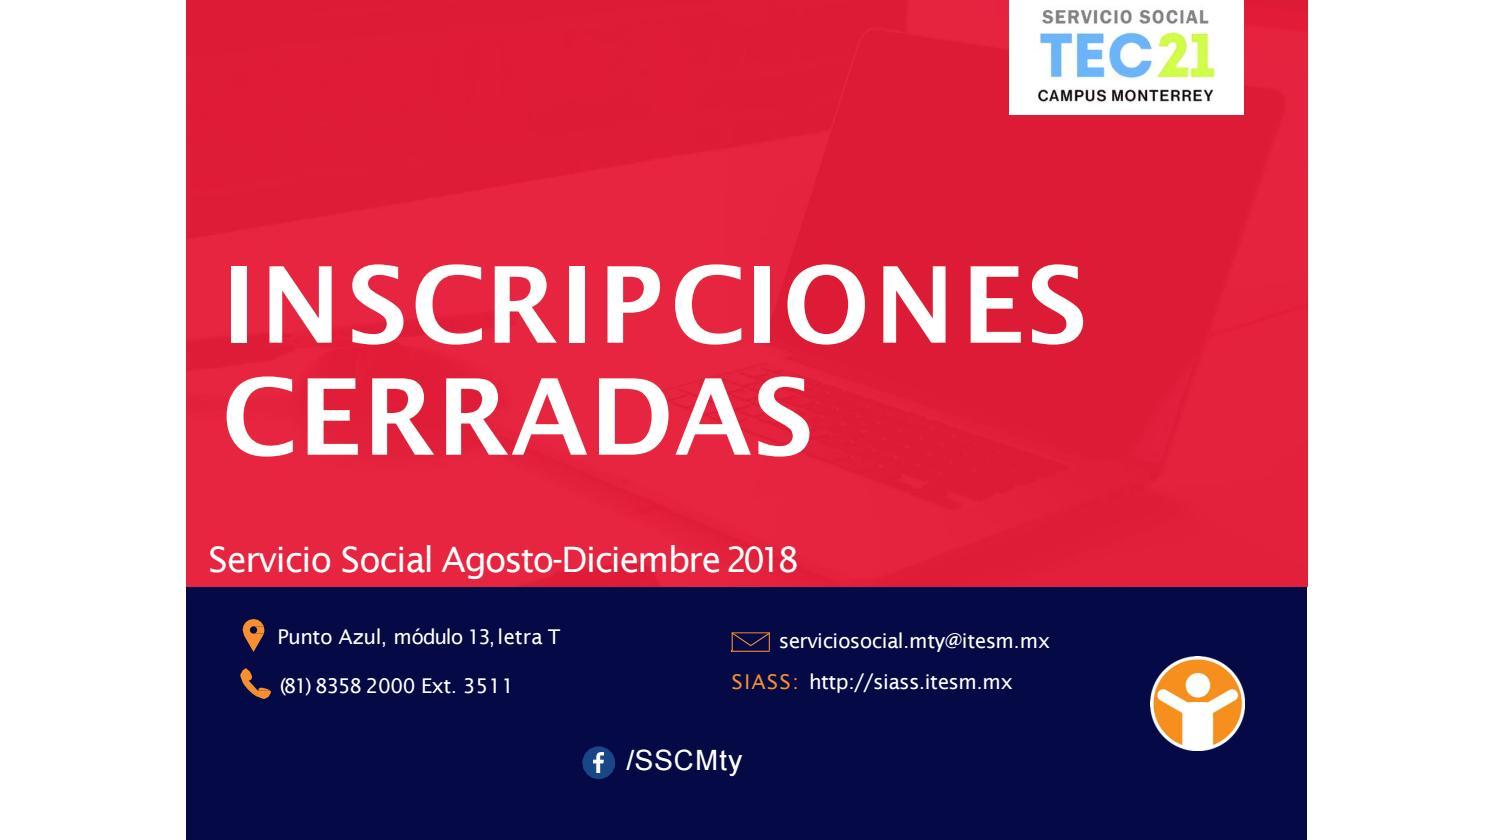 Catálogo proyectos SS semestre AD18 by servicio social campus mty - issuu b82ead0a88e